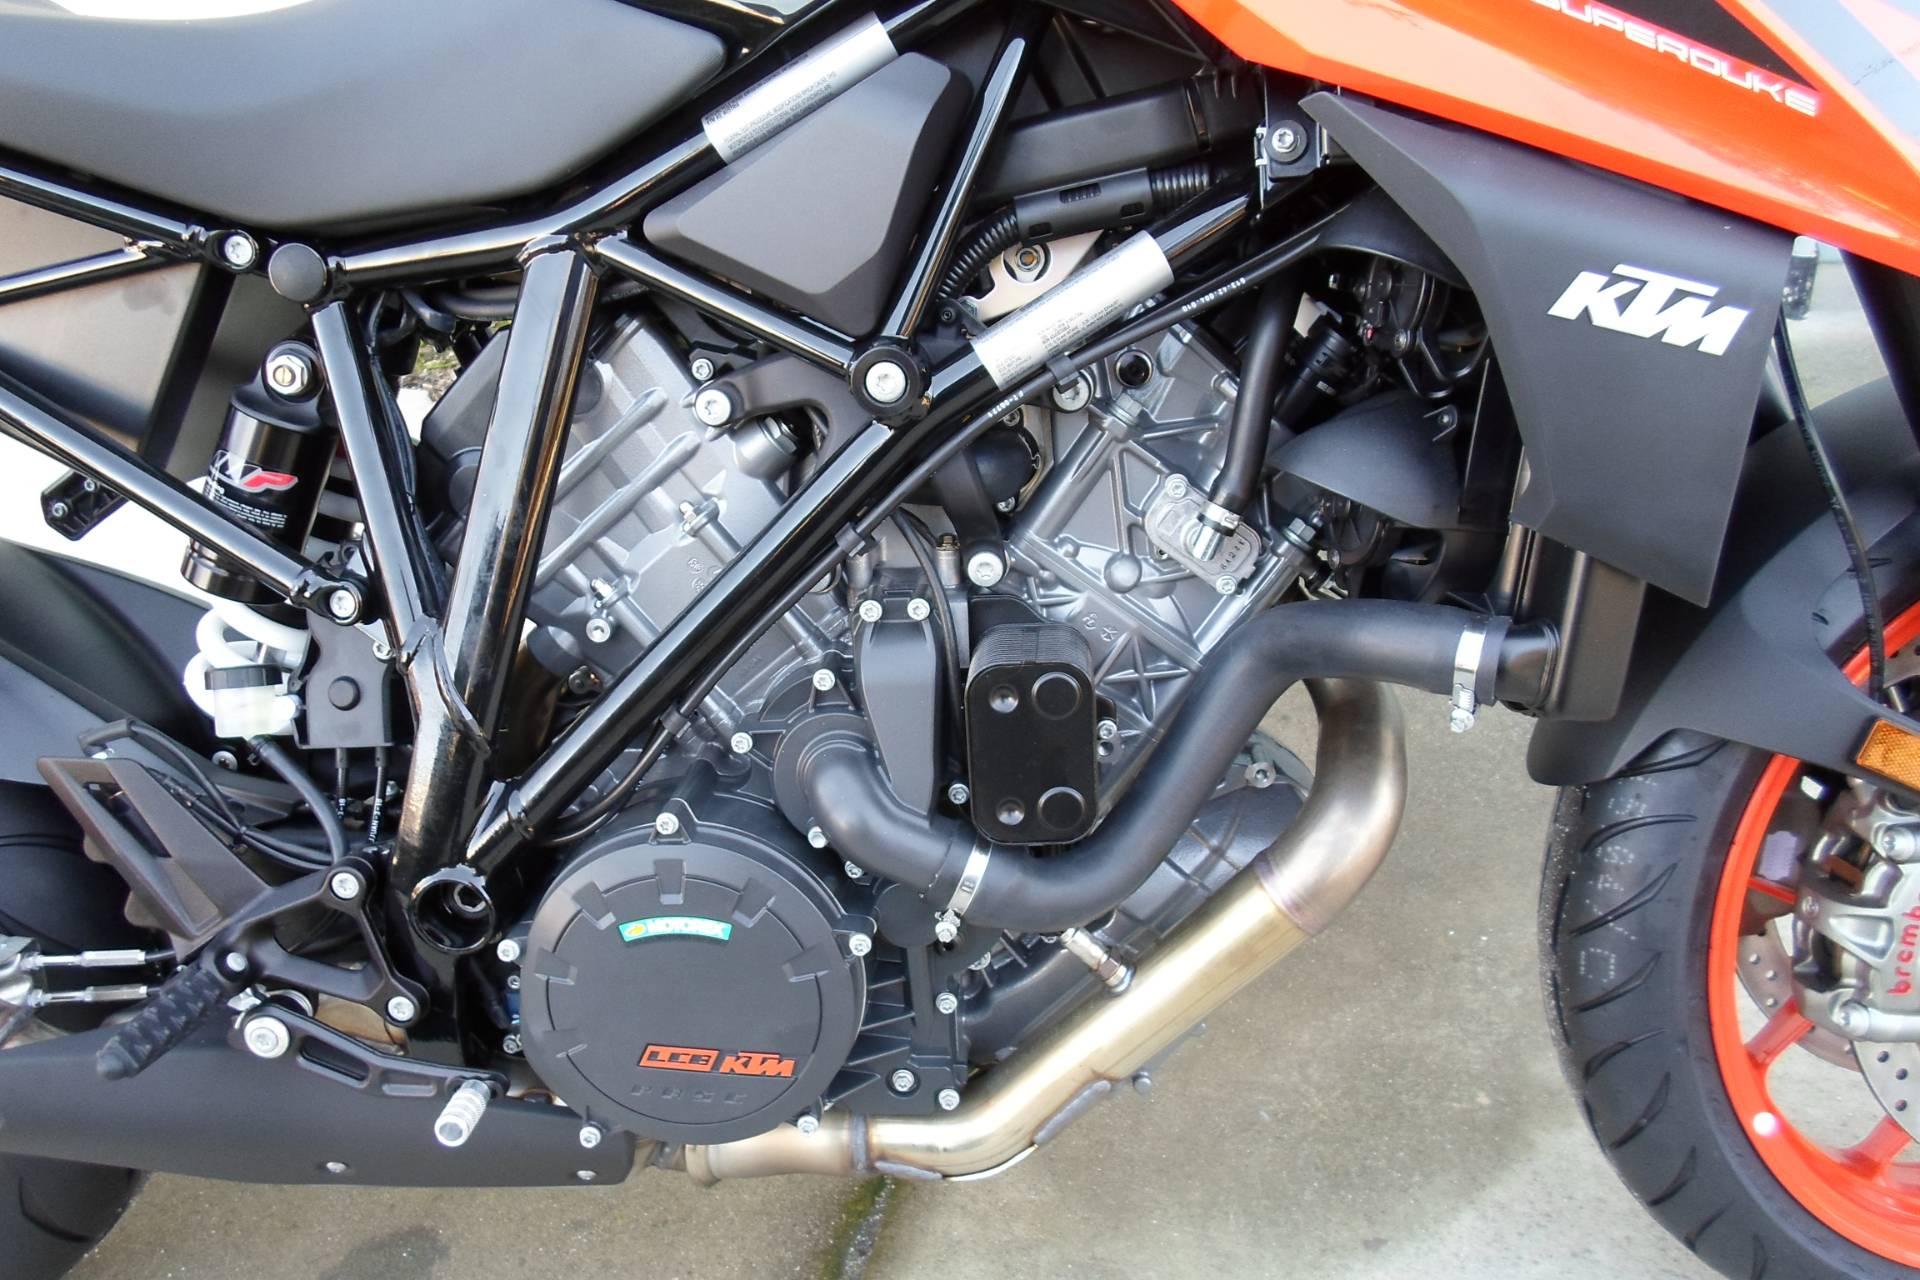 2019 KTM 1290 Super Duke R in San Marcos, California